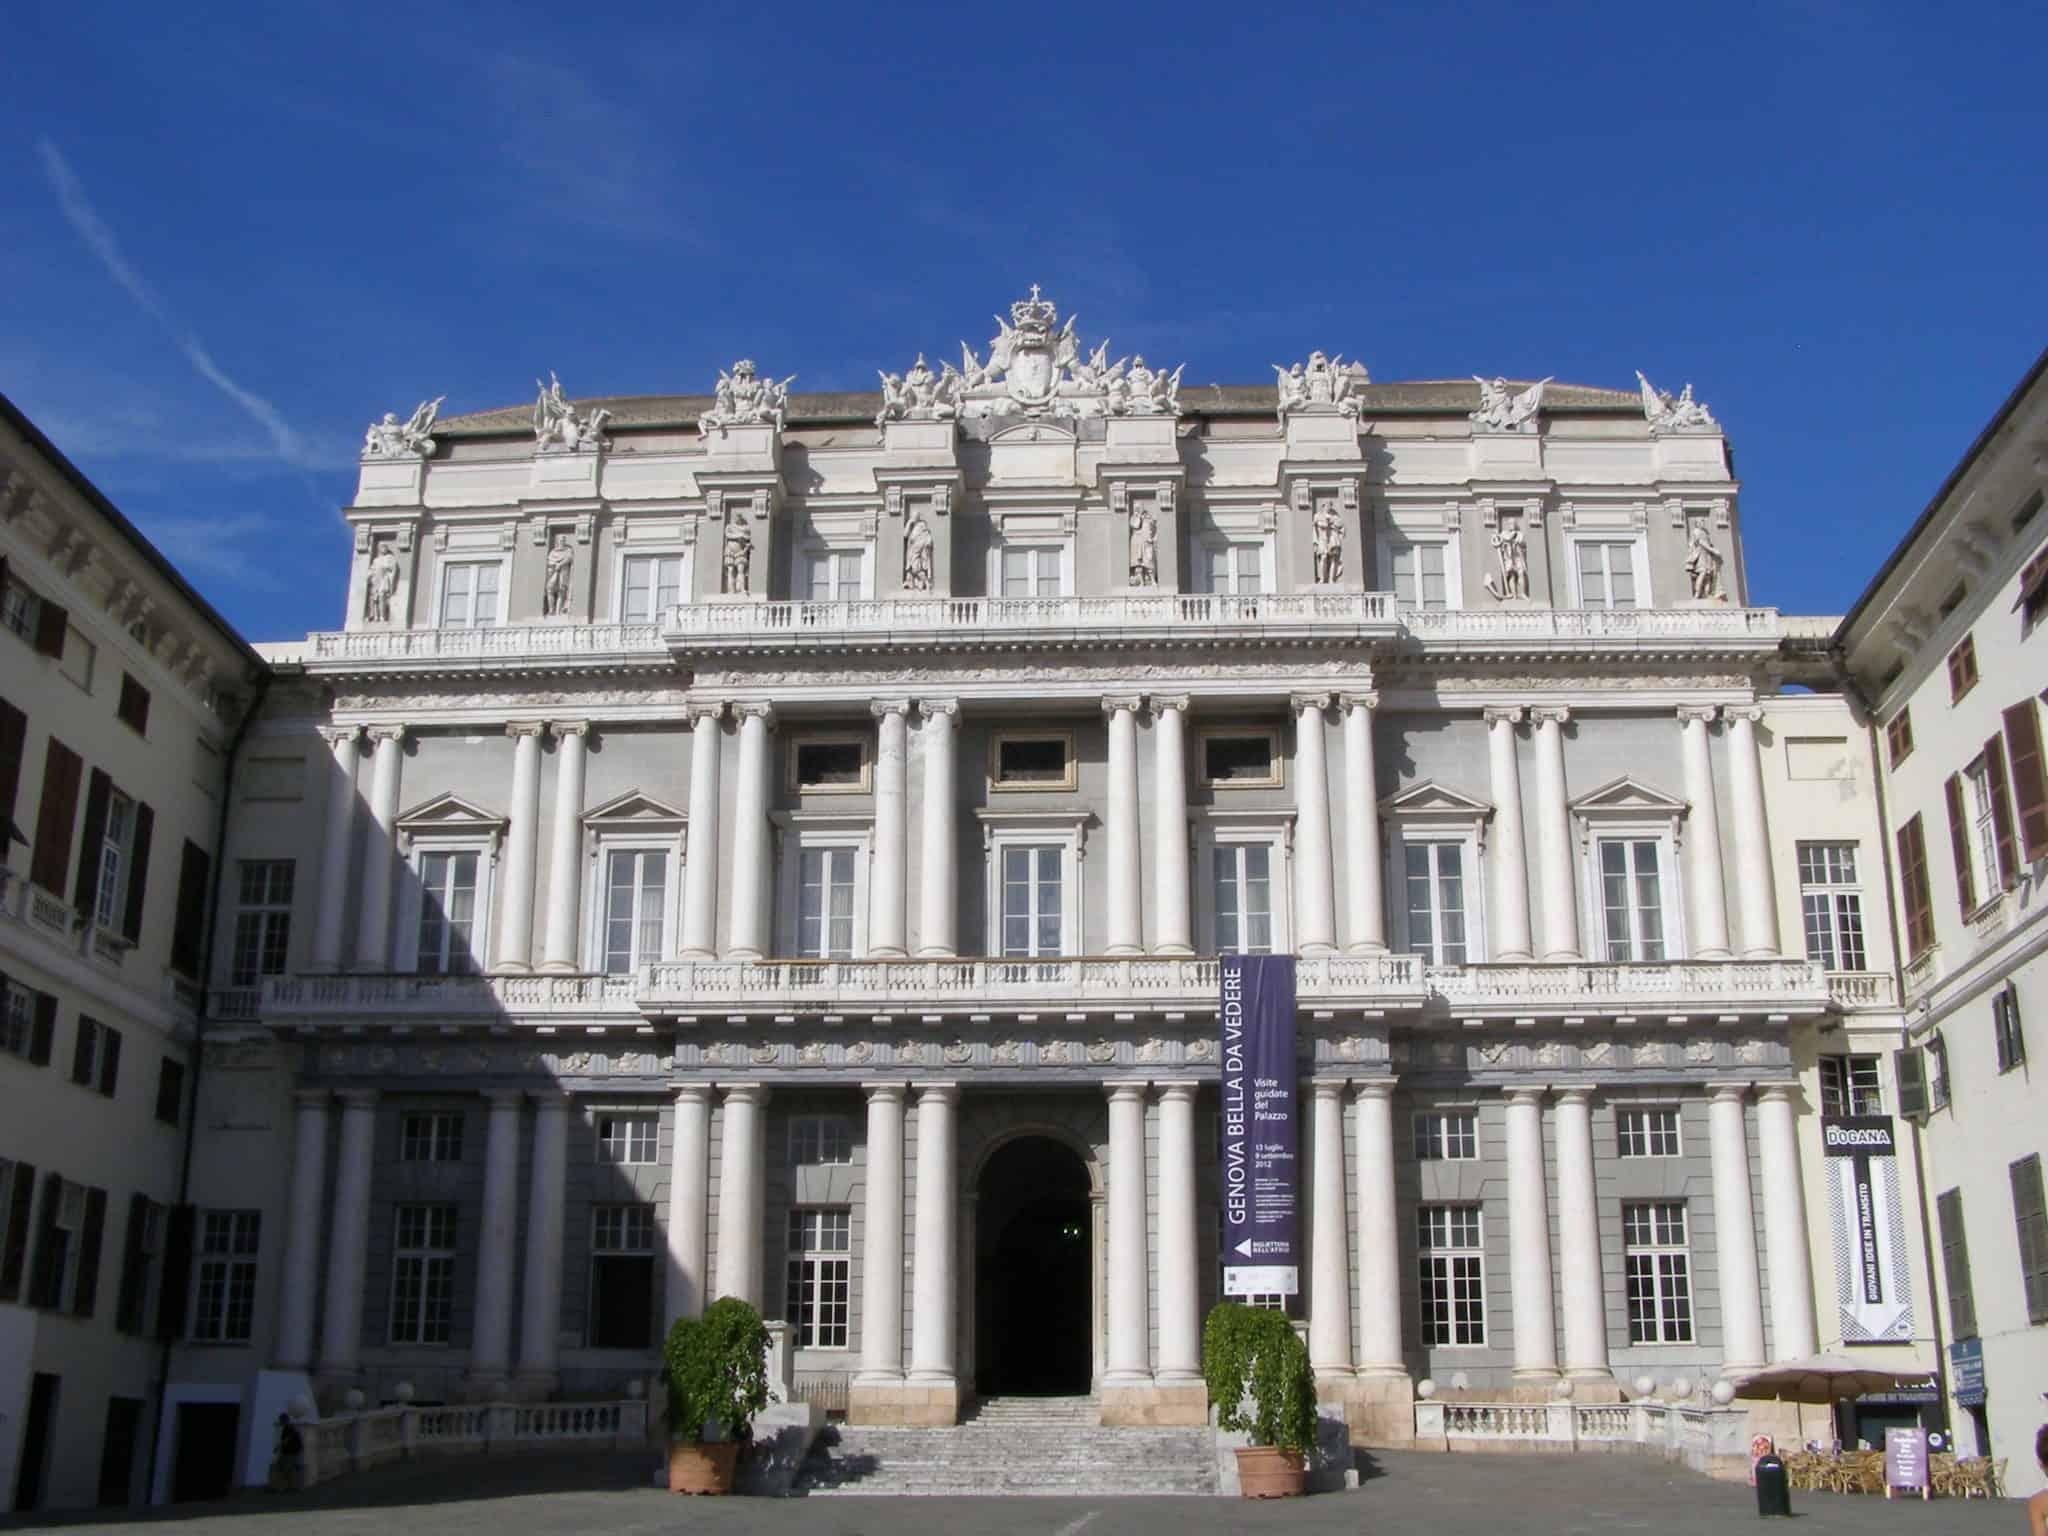 Piazza Matteotti genoa italy